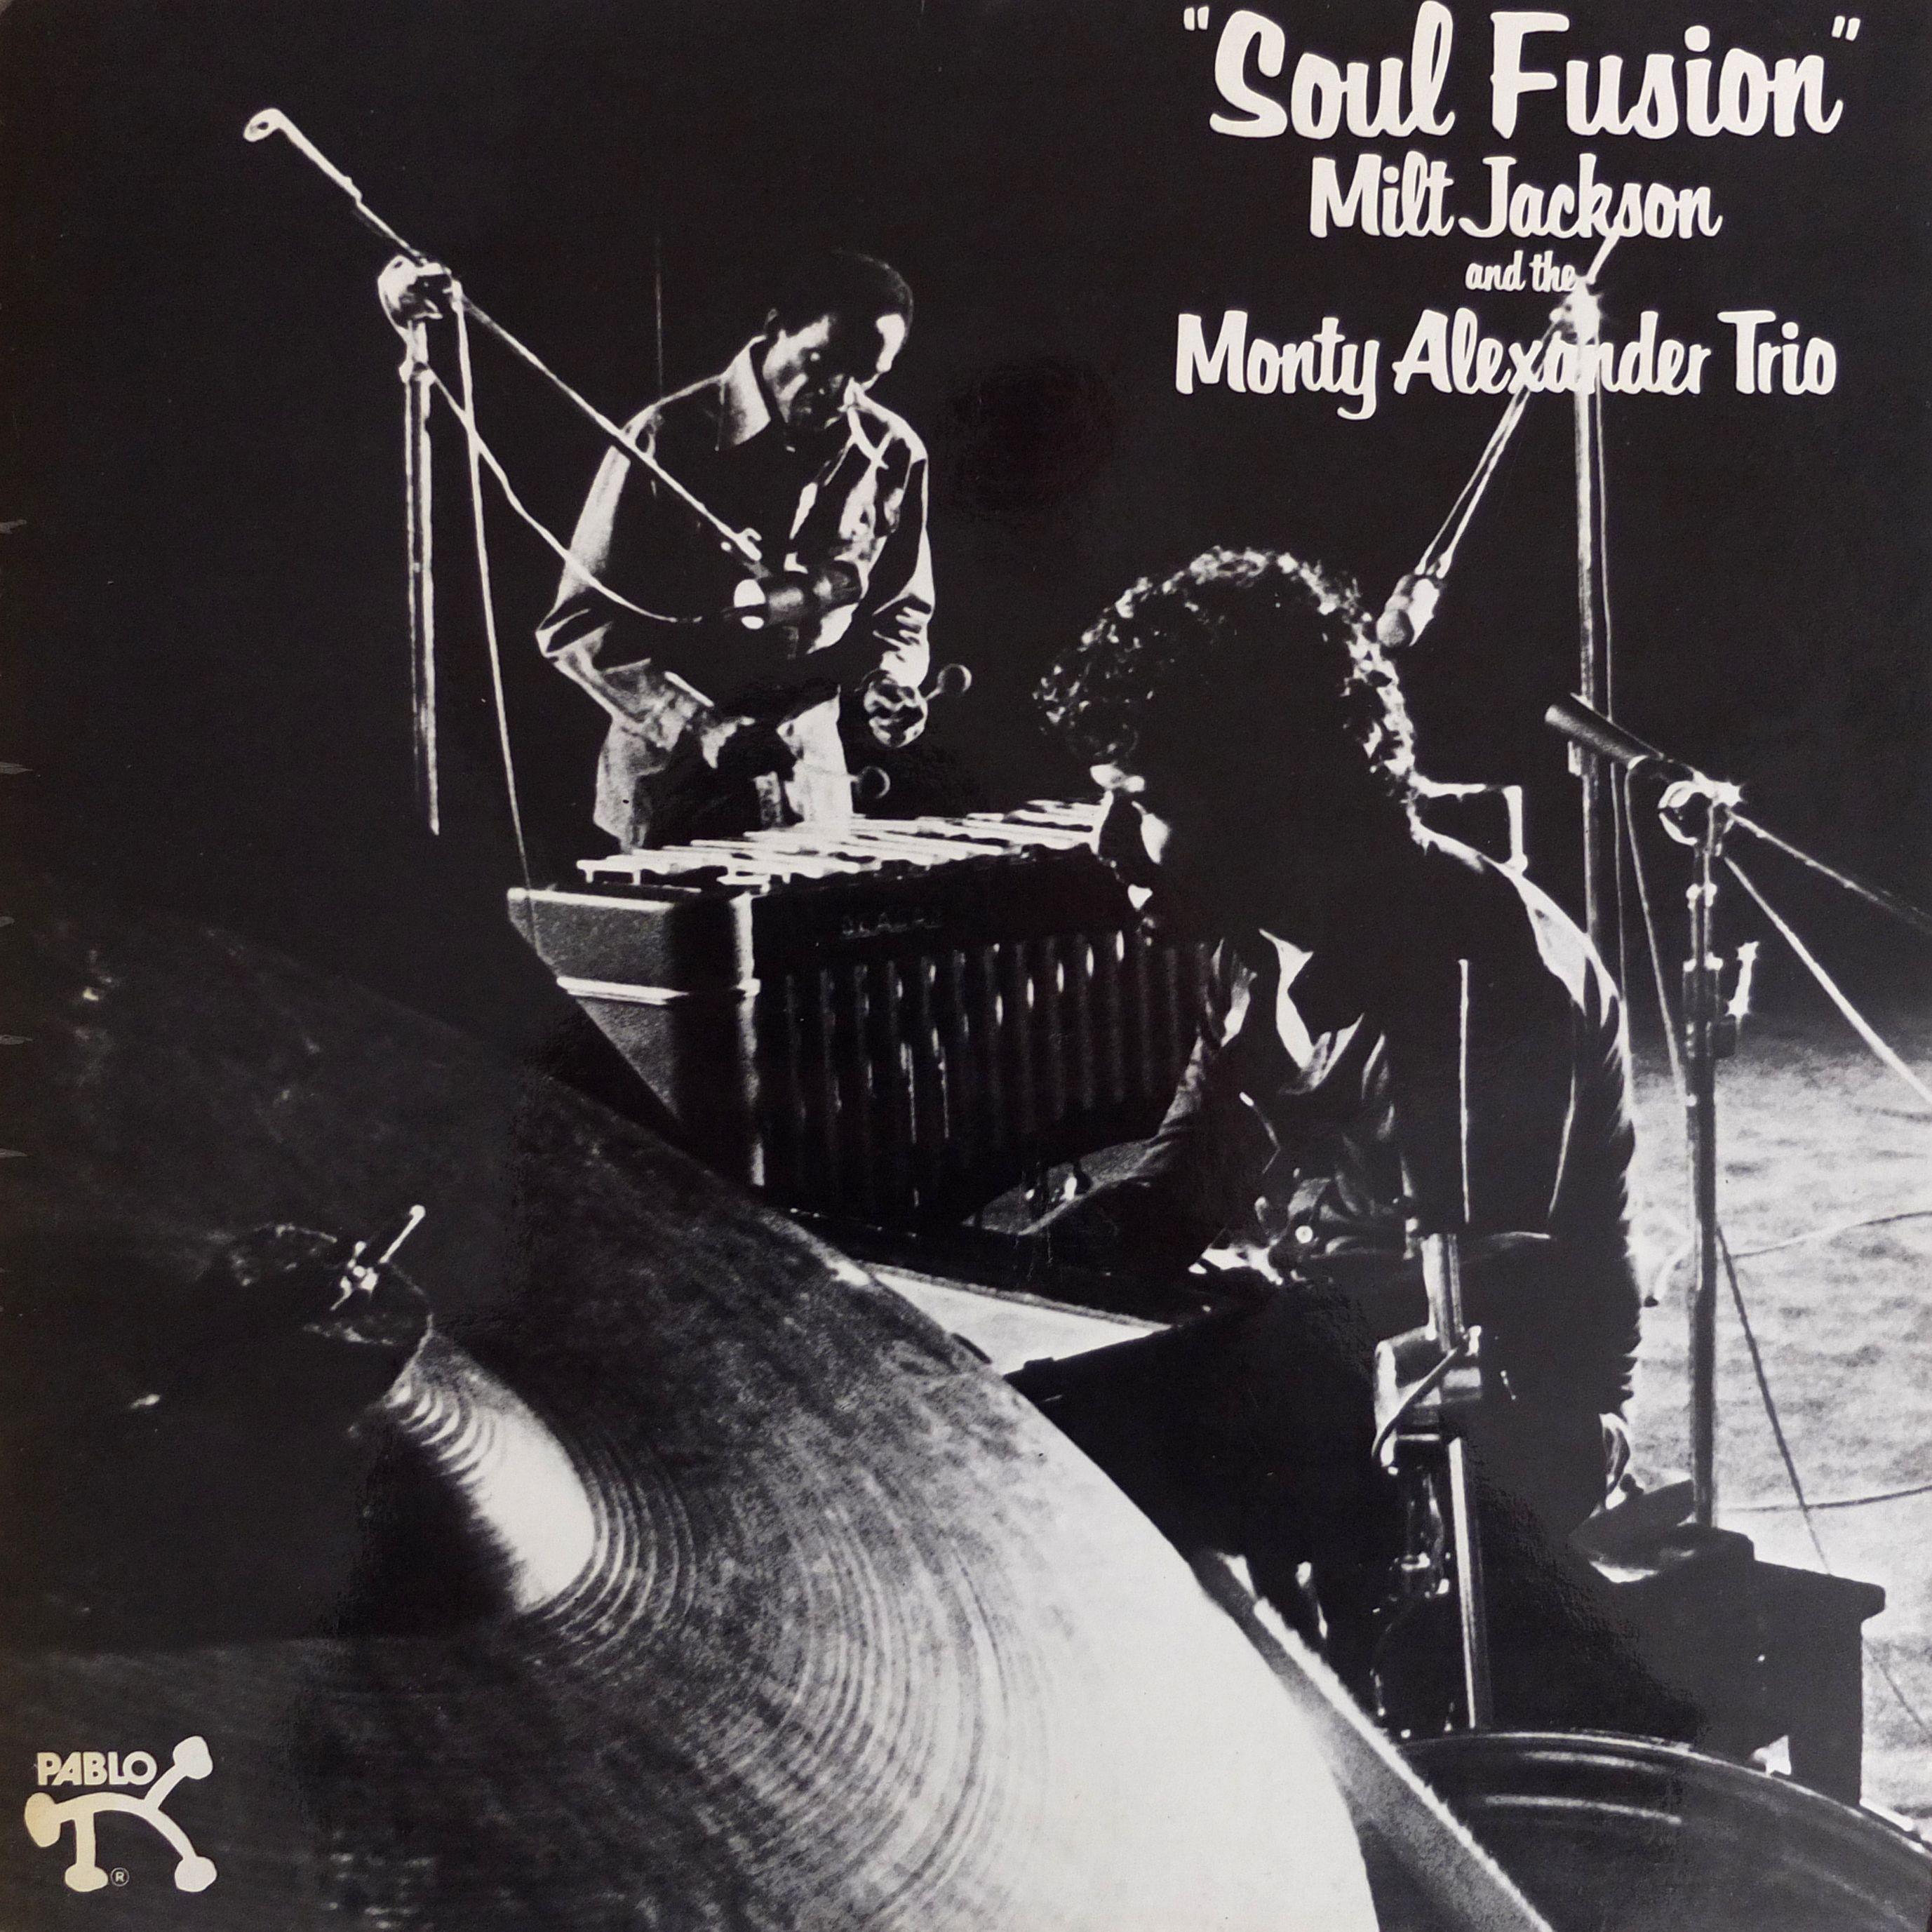 Milt Jackson with Monty Alexander Trio - Soul Fusion - Pablo Records